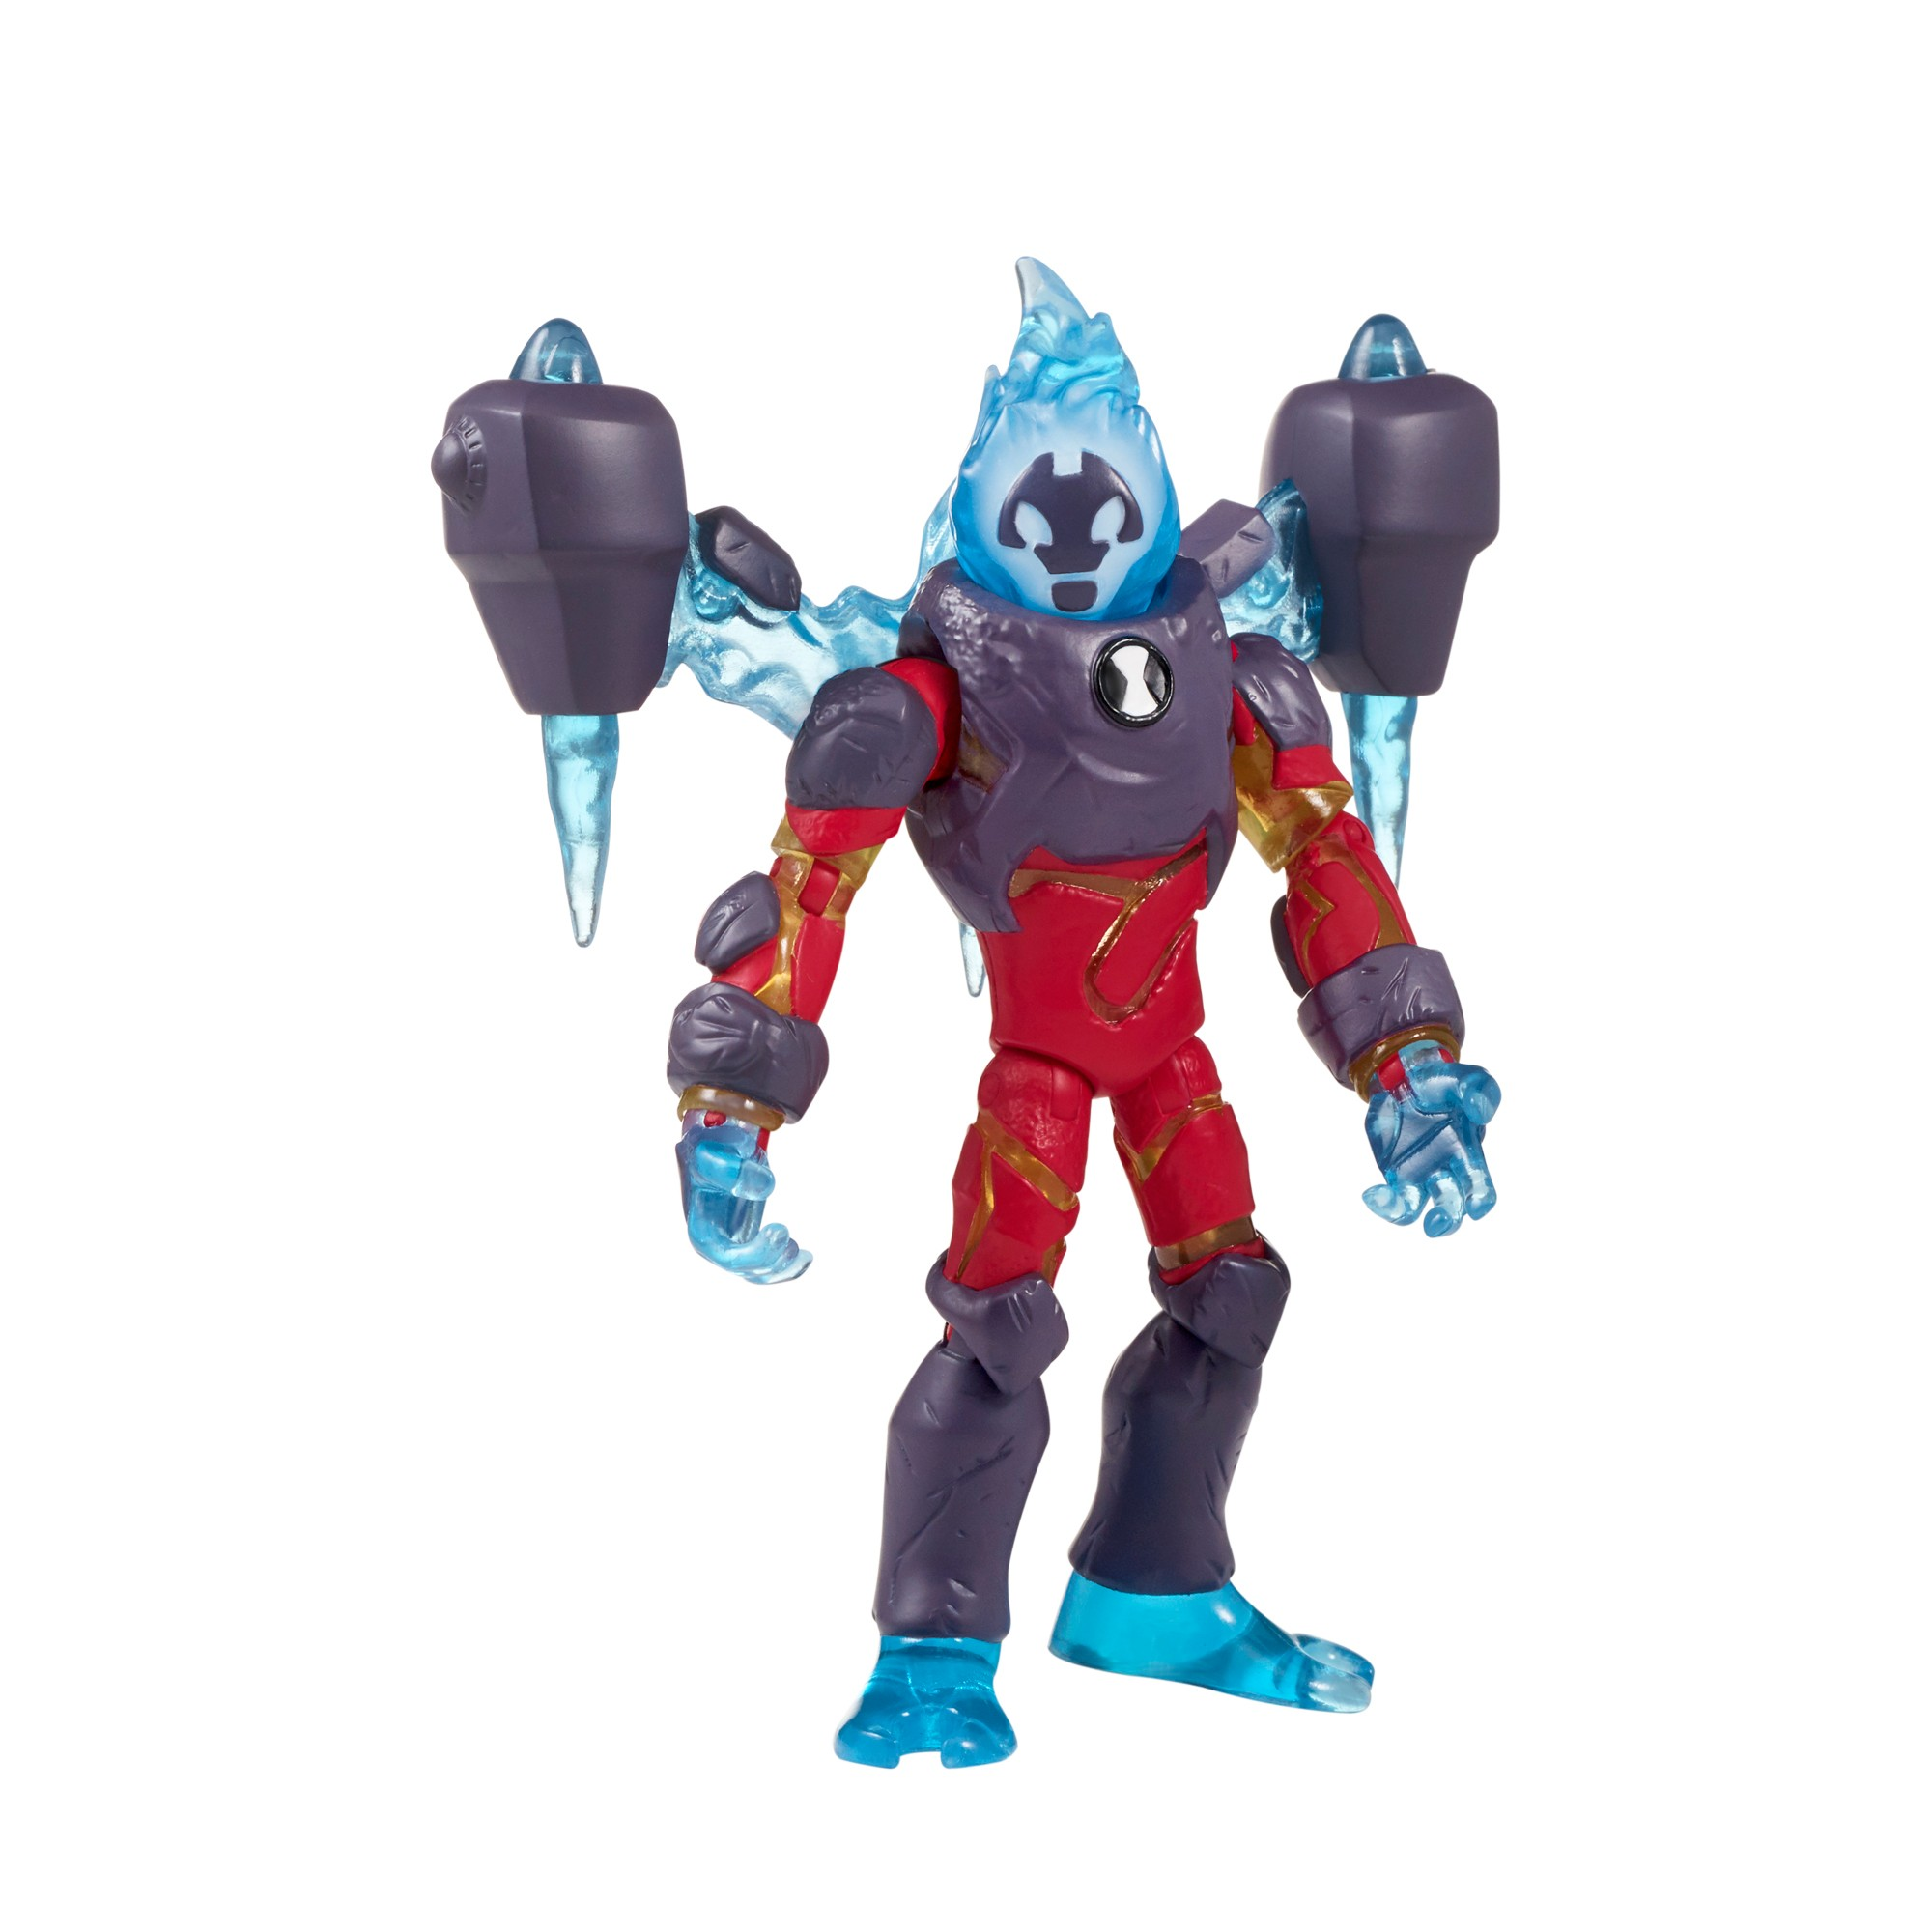 Playmates Toys Ben 10 Giant Action Figure Battle Kids Toy 10inch Heatblast